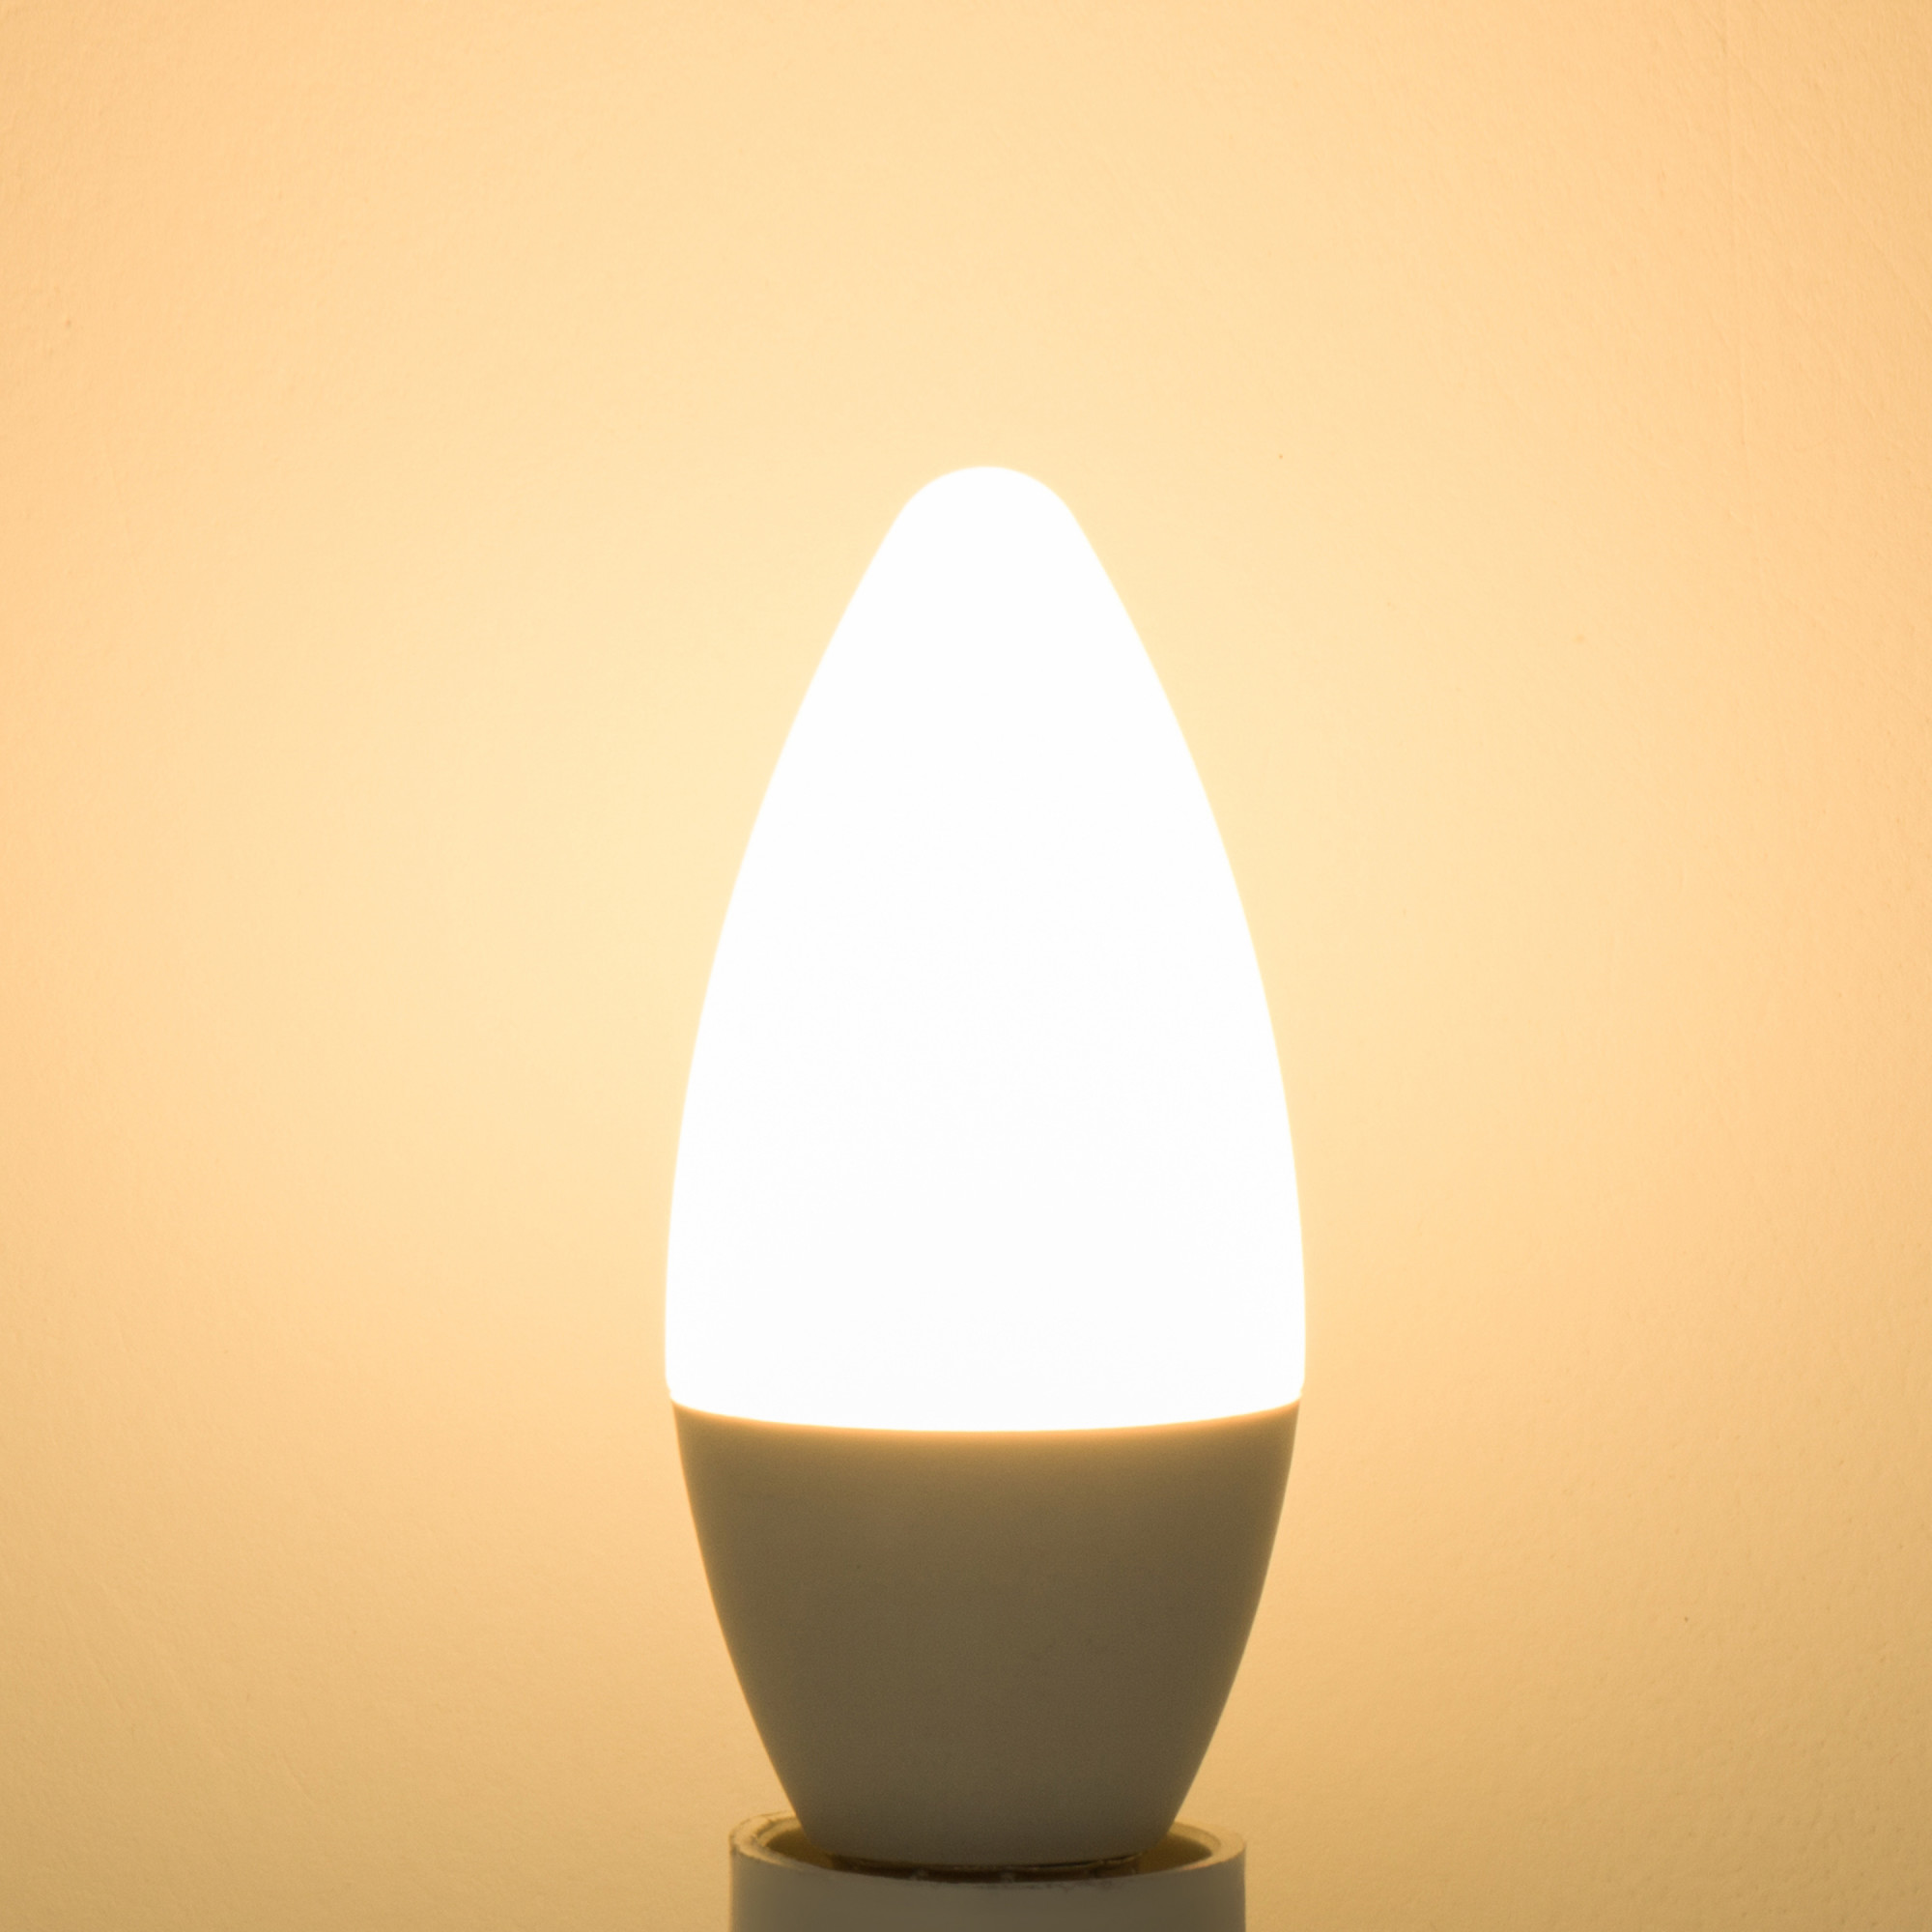 Лампа светодиодная Lexman E14 5.5 Вт 470 Лм свет тёплый